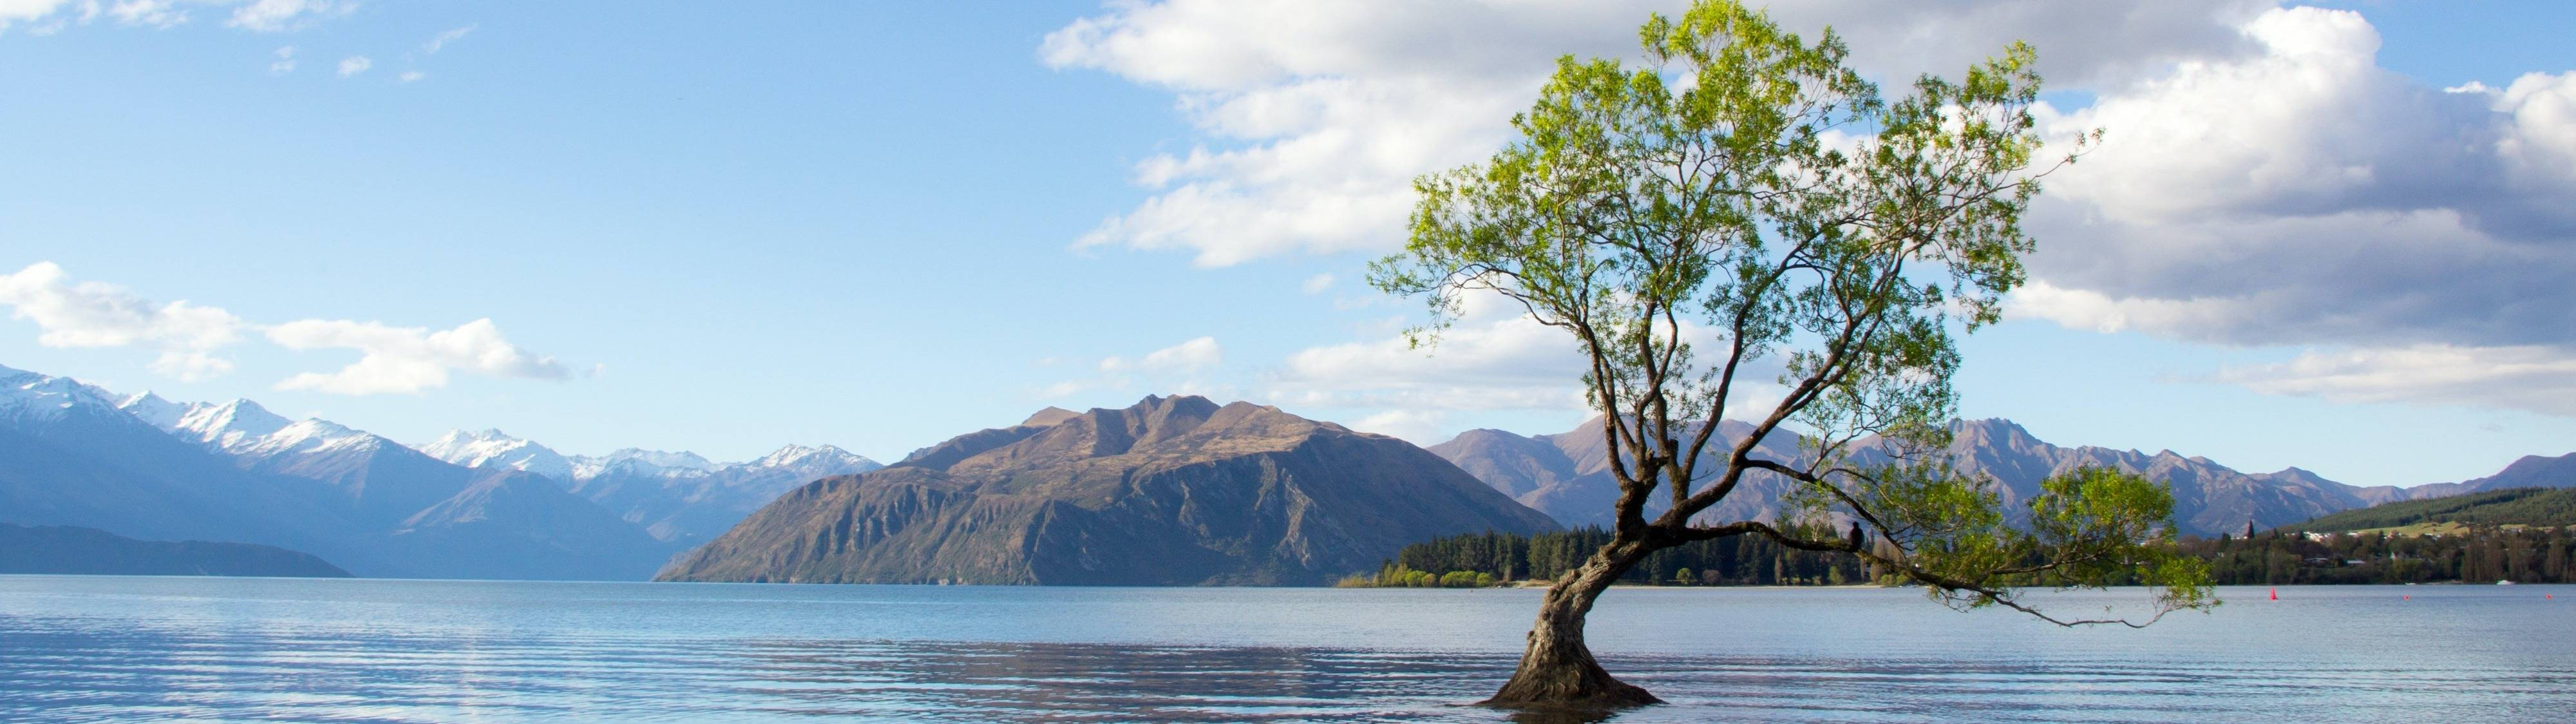 Reiseplaner World and Travel Neuseeland